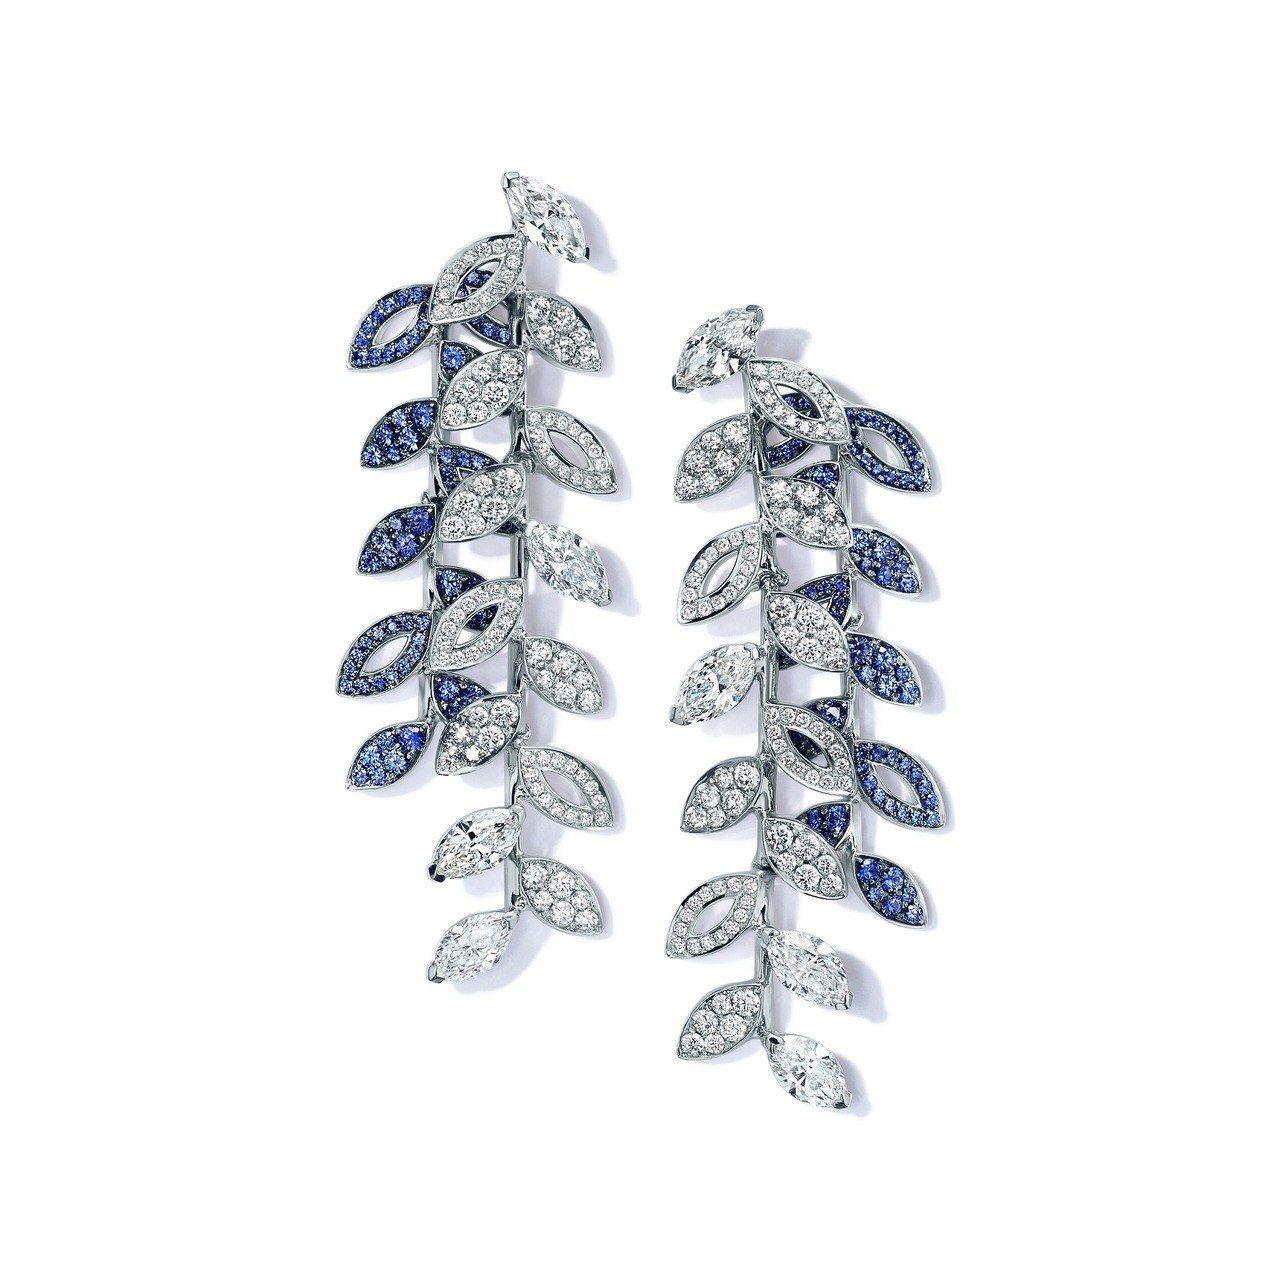 Tiffany鉑金鑲嵌混合式切割藍寶石與鑽石蕨葉造型耳環,價格店洽。圖/Tiff...